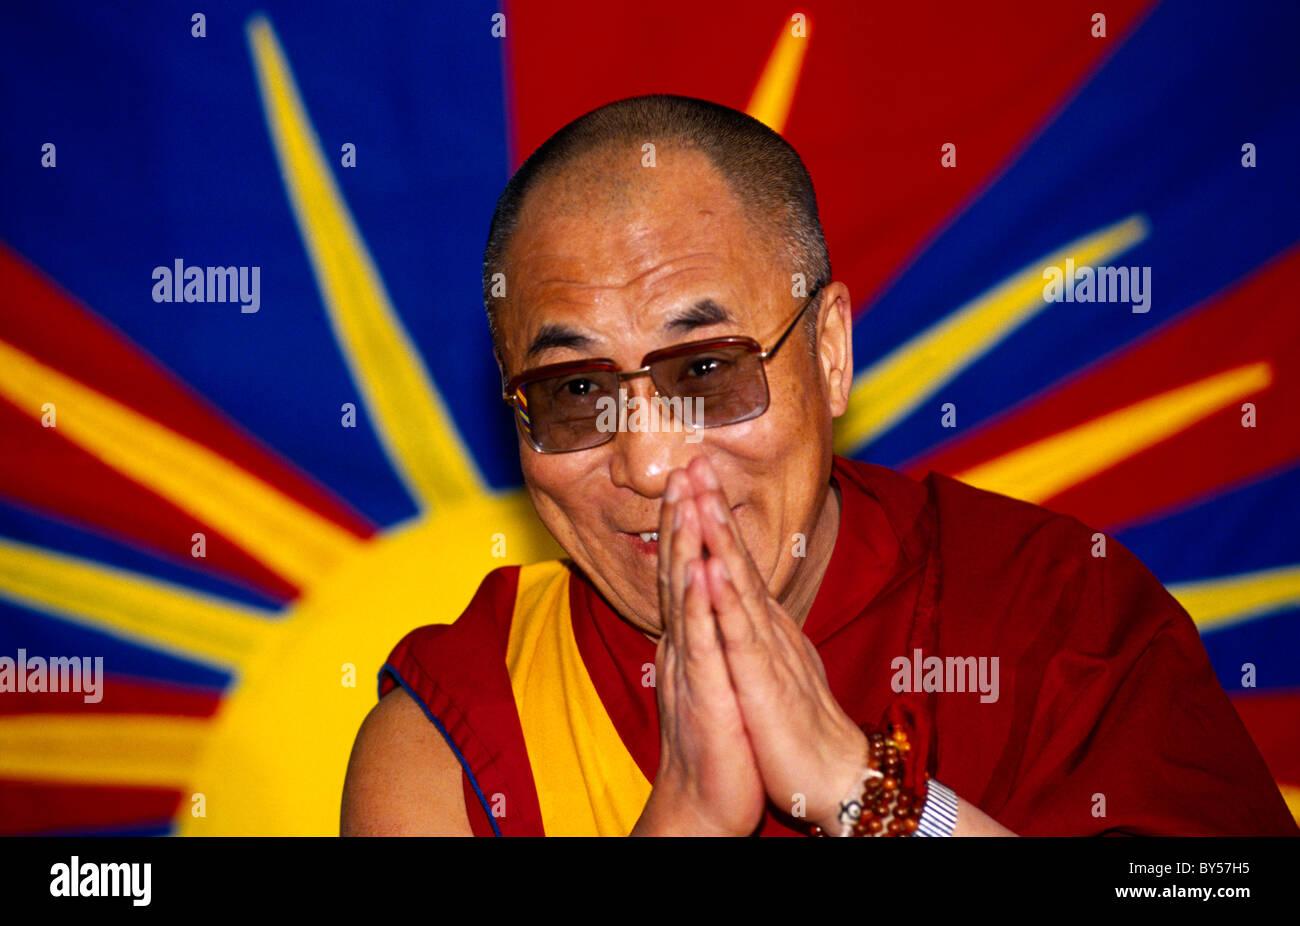 tenzin gyatso the 14th dalai lama The dalai lama's biography his holiness the xivth dalai lama, tenzin gyatso, is the spiritual and temporal leader of the tibetan peoplehe was born in a small village called takster in northeastern tibet.